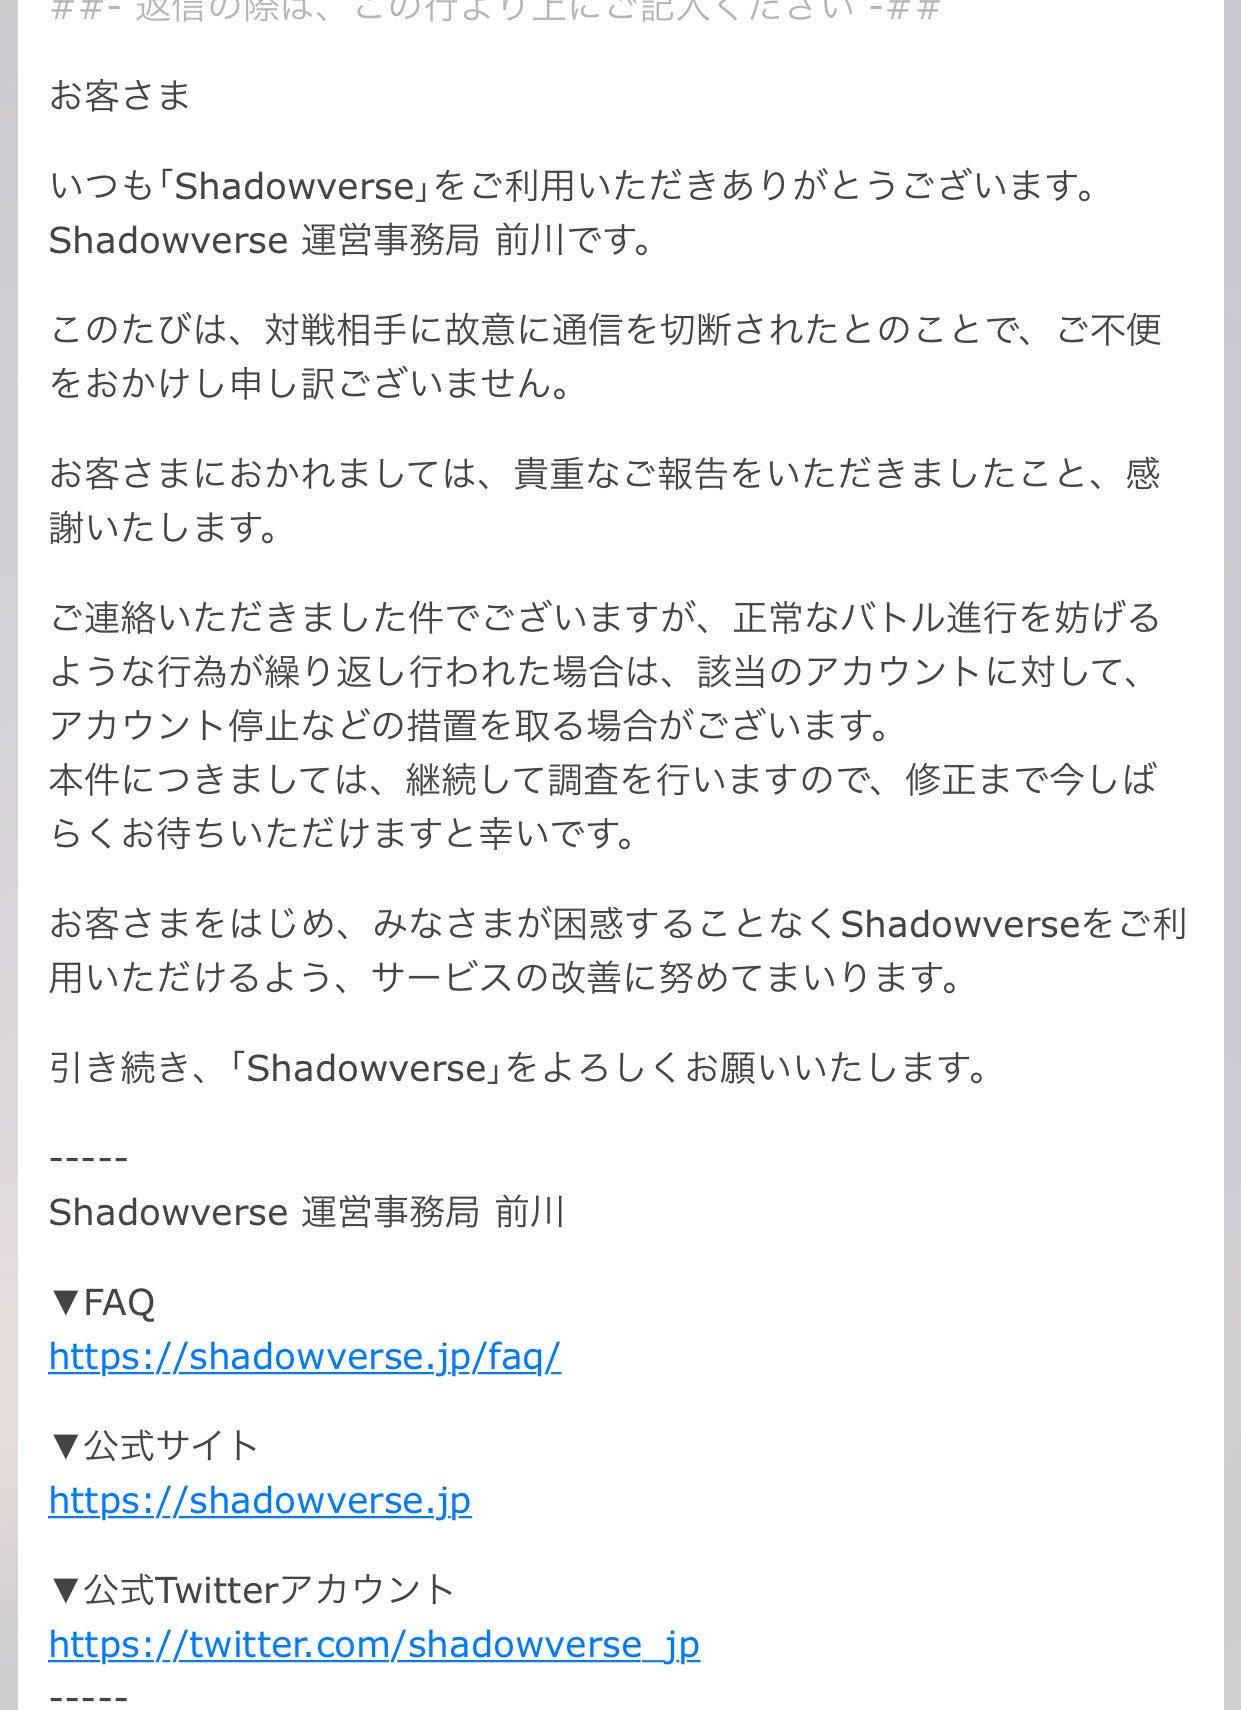 Shadowverse 切断バグ使い晒しスレ5【シャドウバース】 [無断転載禁止]©2ch.net->画像>1037枚